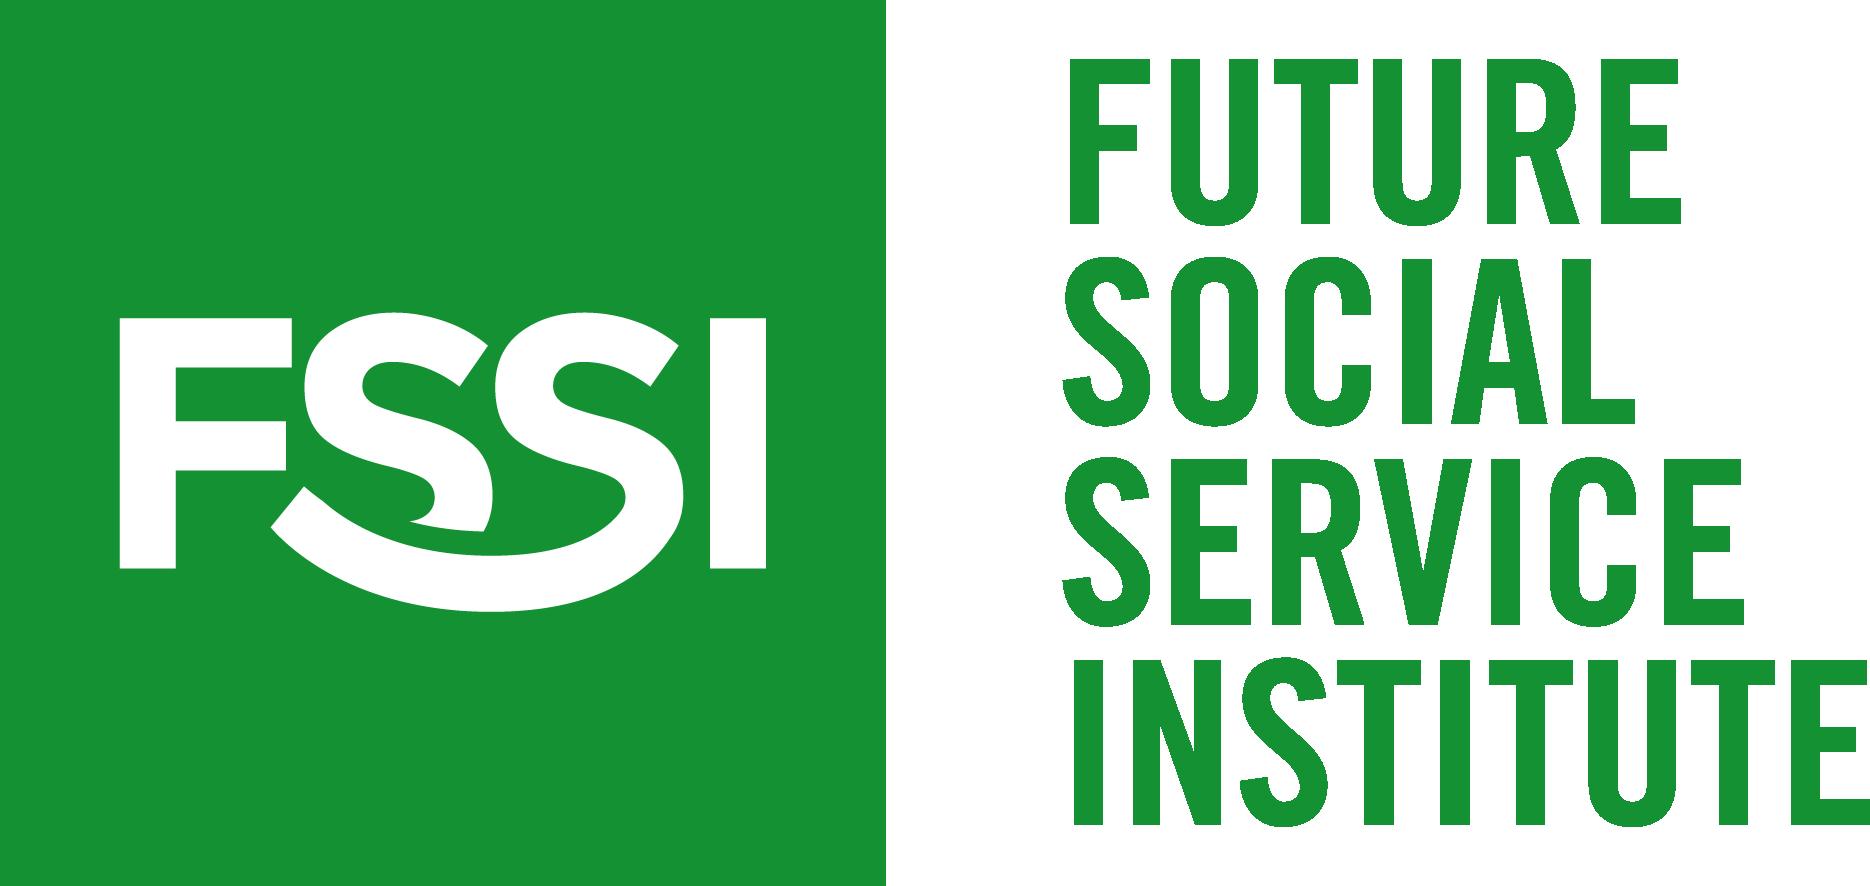 Future Social Service Institute (FSSI)